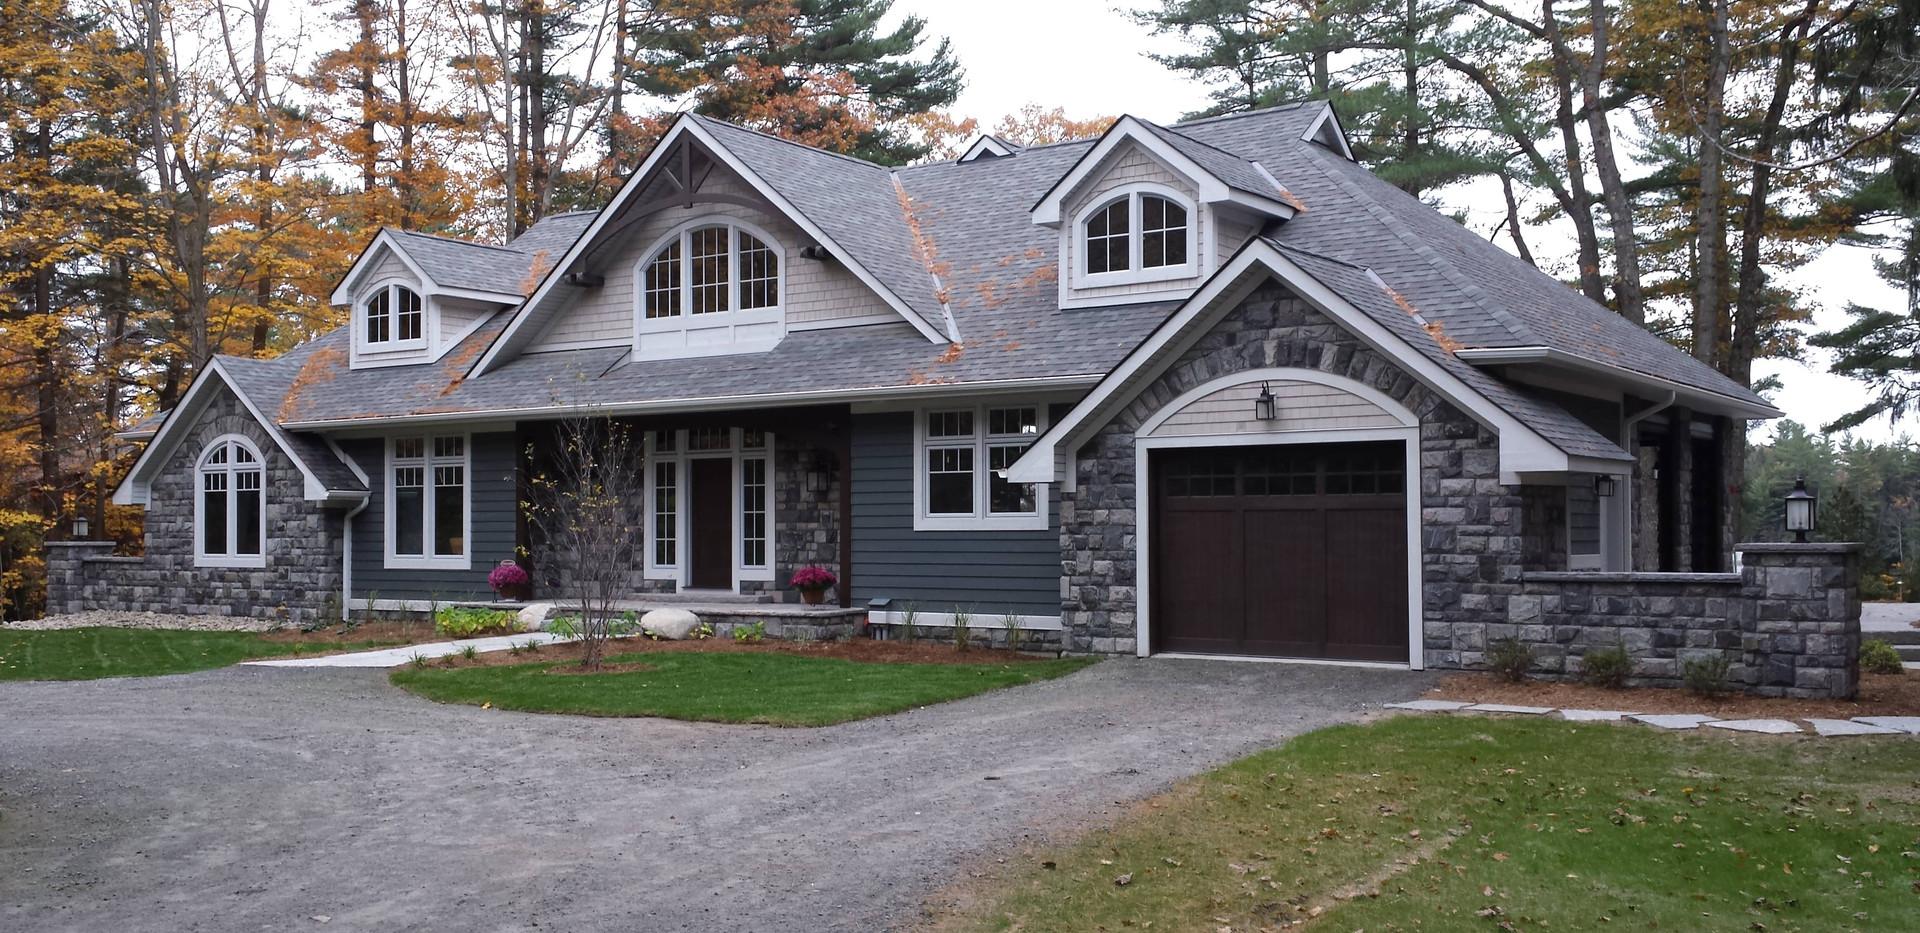 Intricate Roof Lines on Large Grey Cottage Muskoka